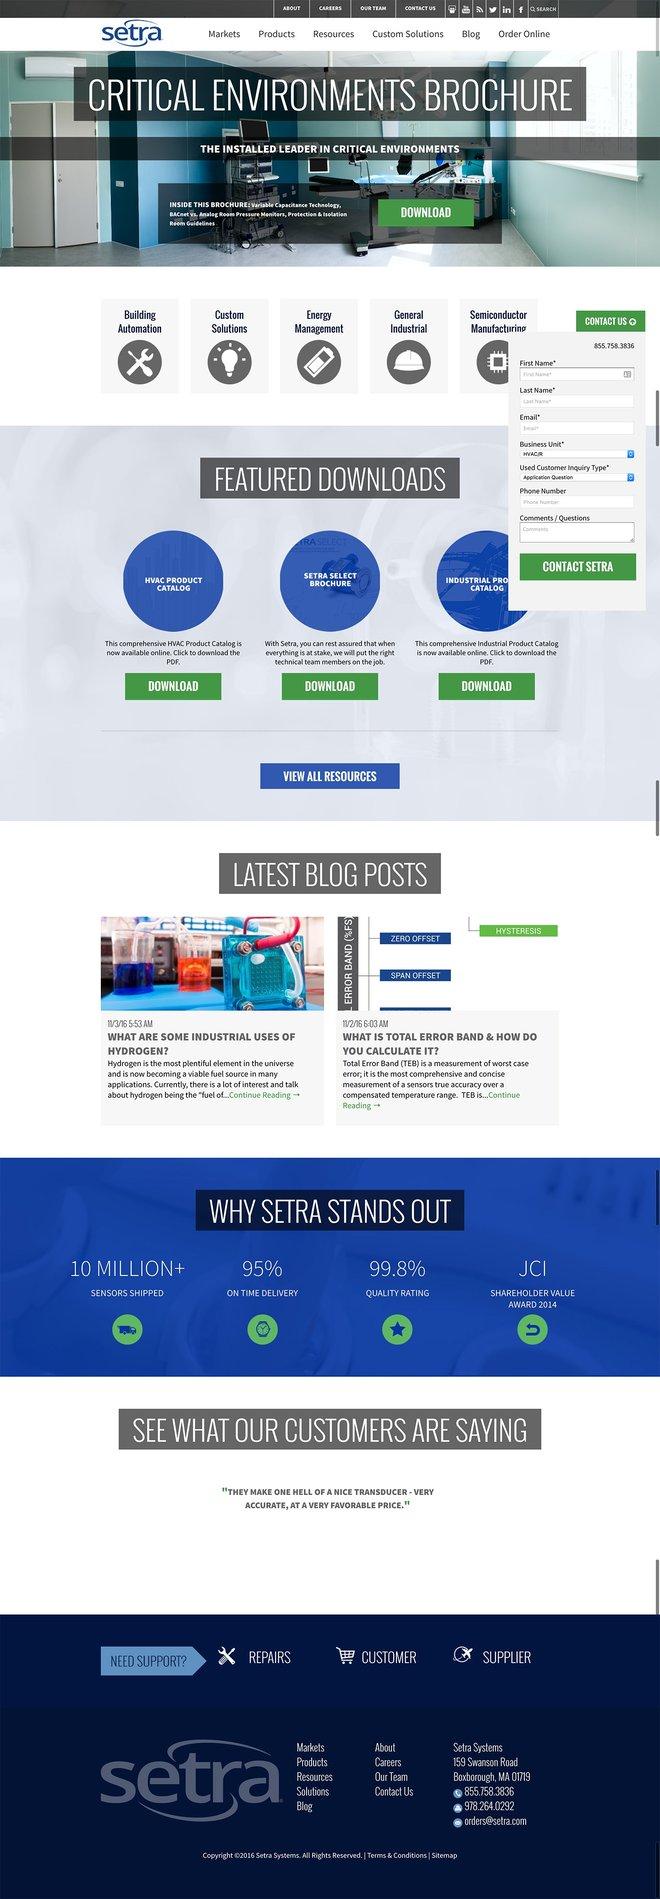 Setra Desktop.jpg